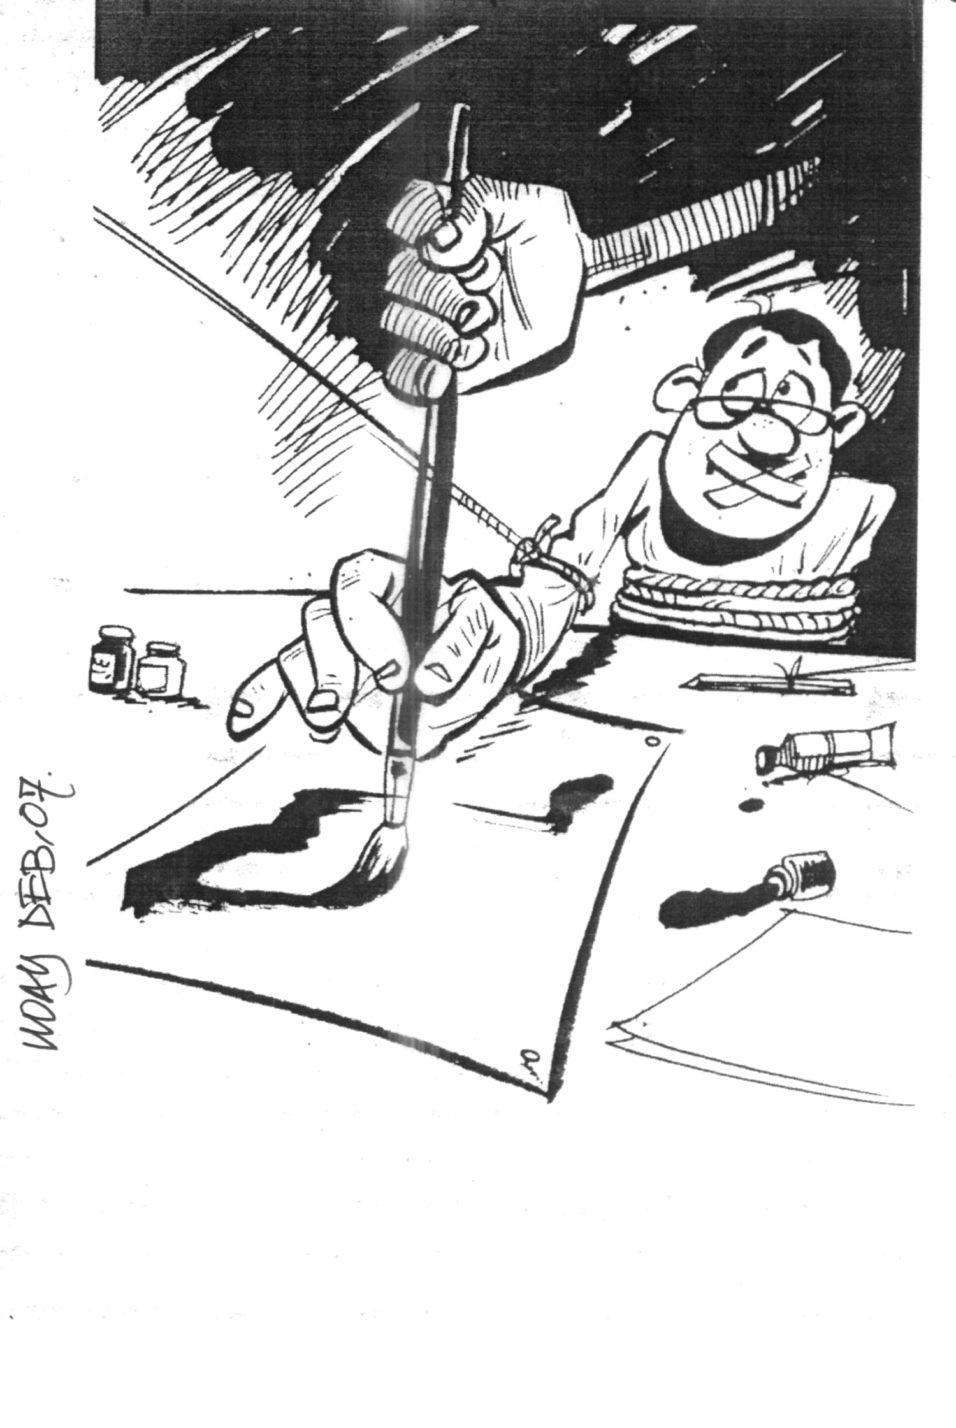 Uday Deb_Cartoonpattor 001